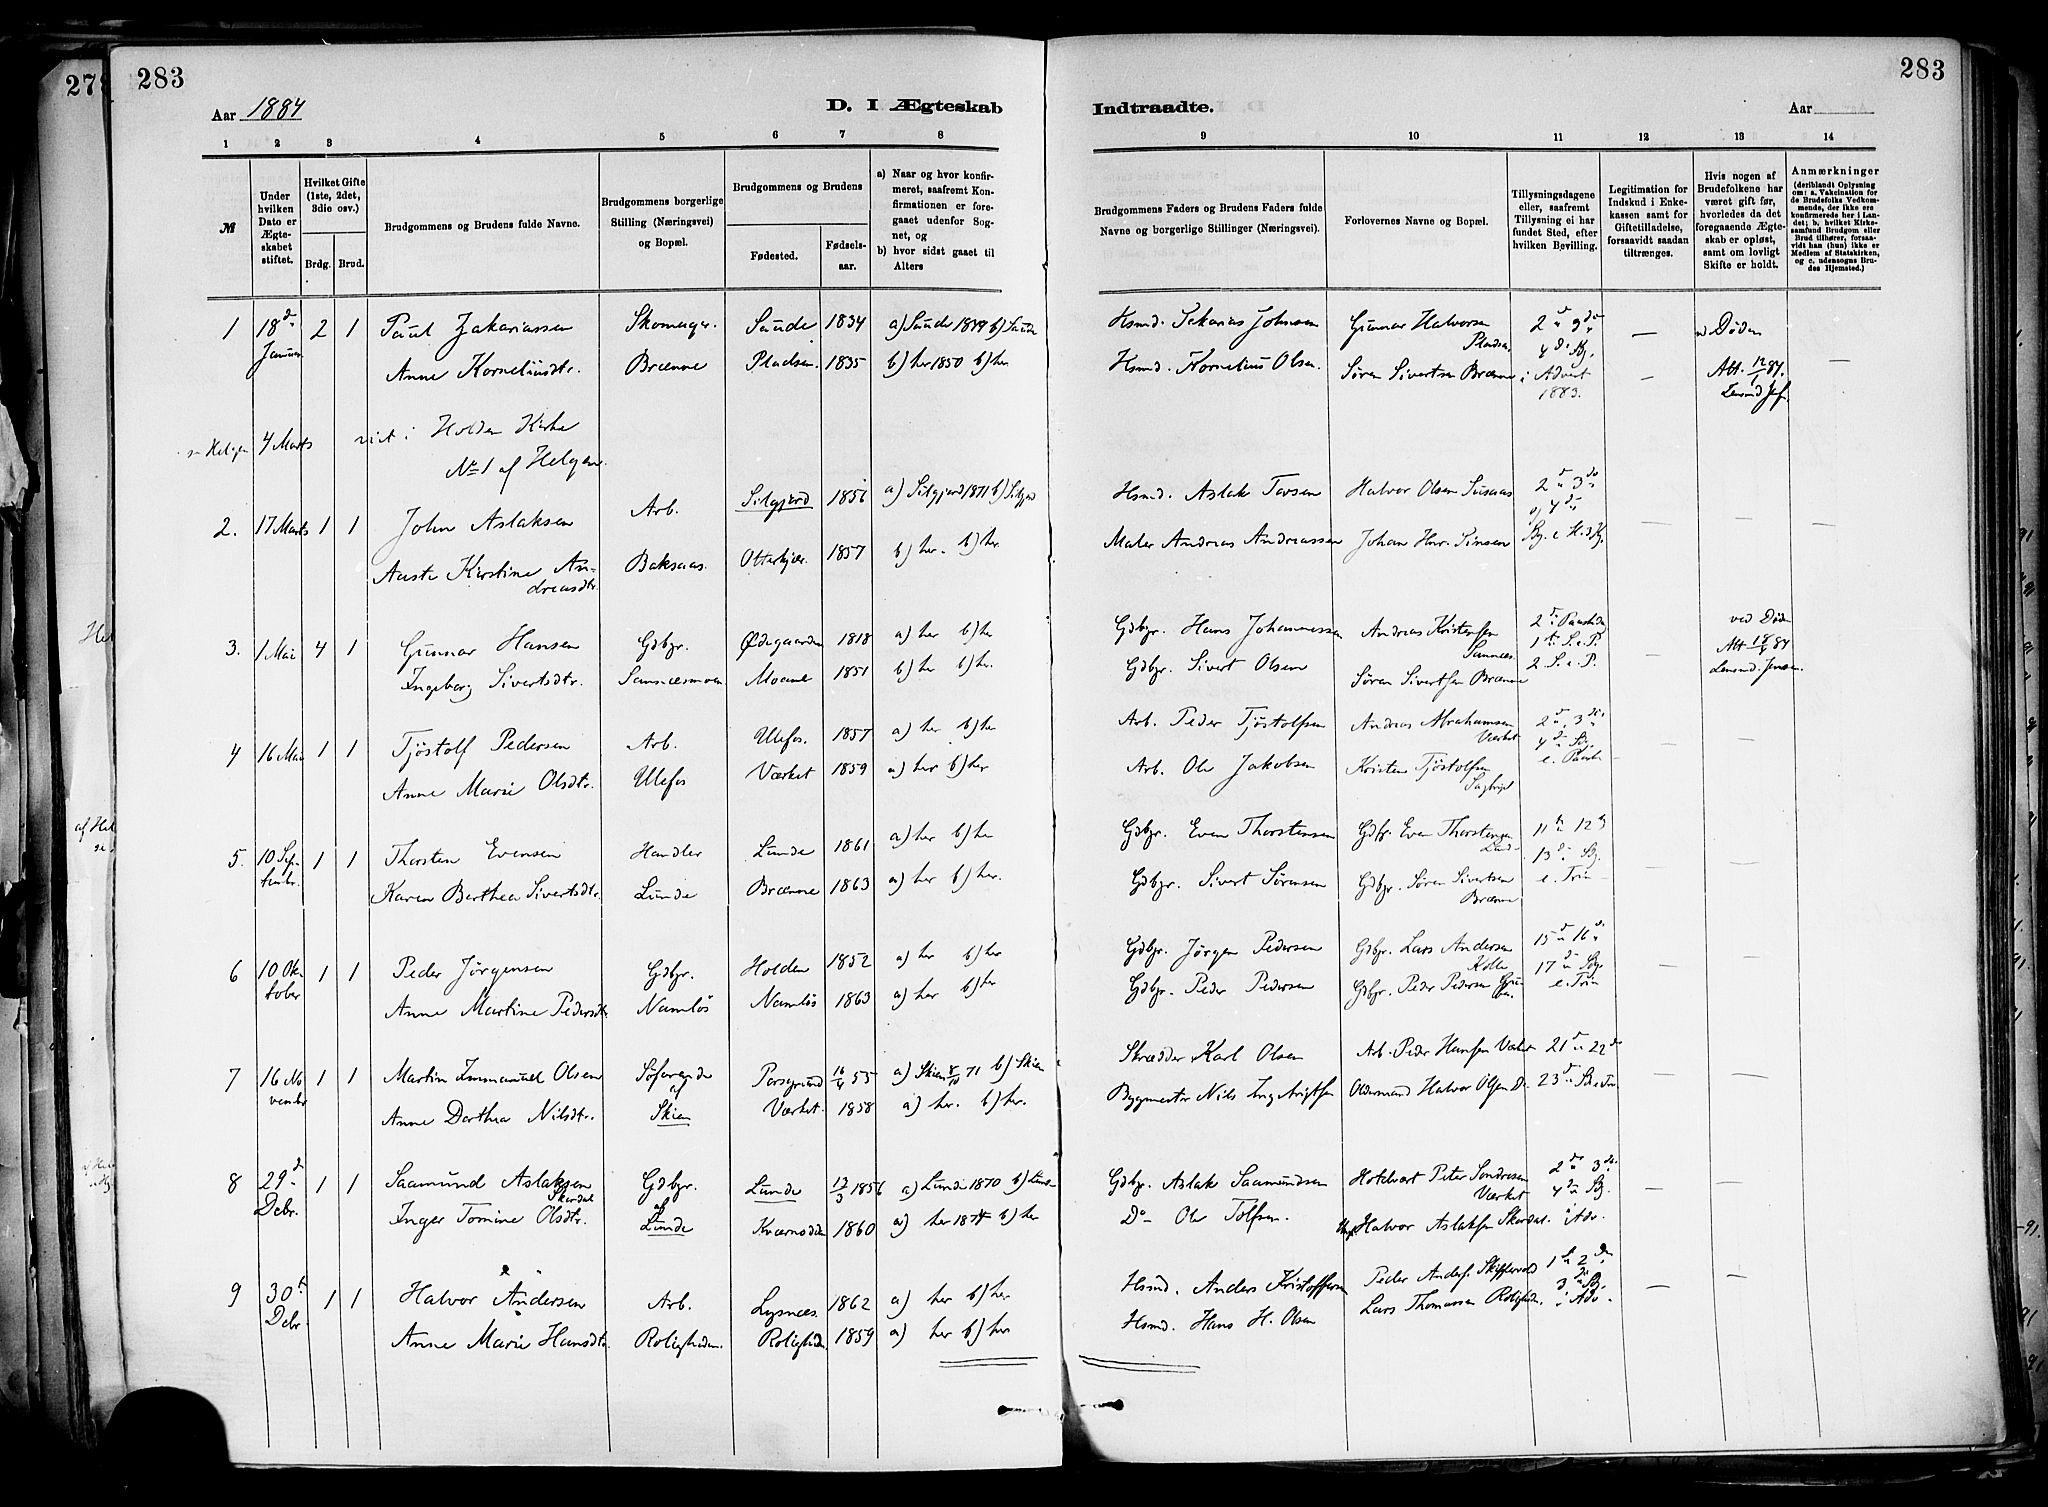 SAKO, Holla kirkebøker, F/Fa/L0008: Ministerialbok nr. 8, 1882-1897, s. 283